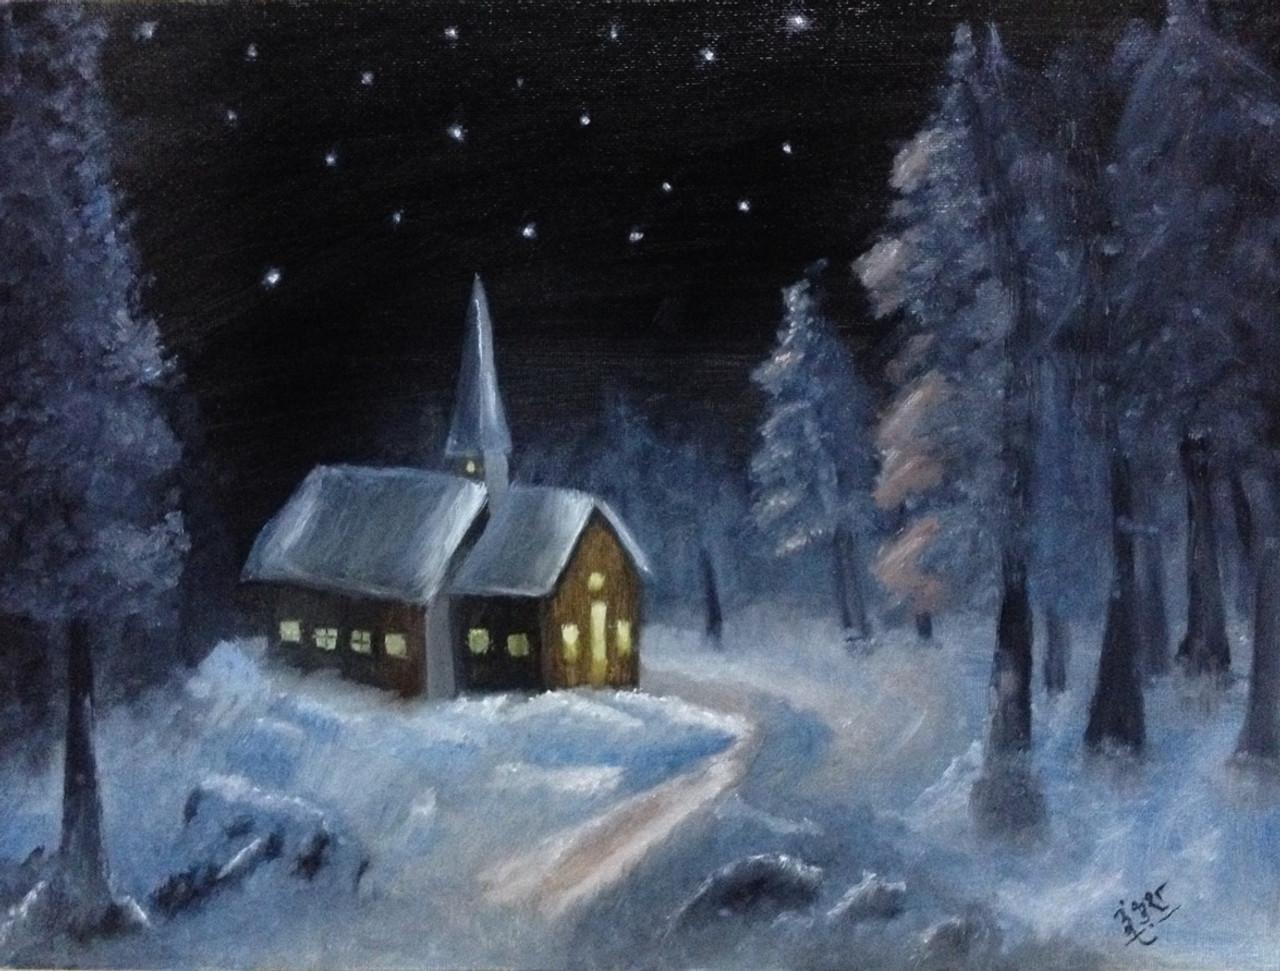 Snowy Christmas.Snowy Christmas Art 1798 14584 Handpainted Art Painting 16in X 12in Framed